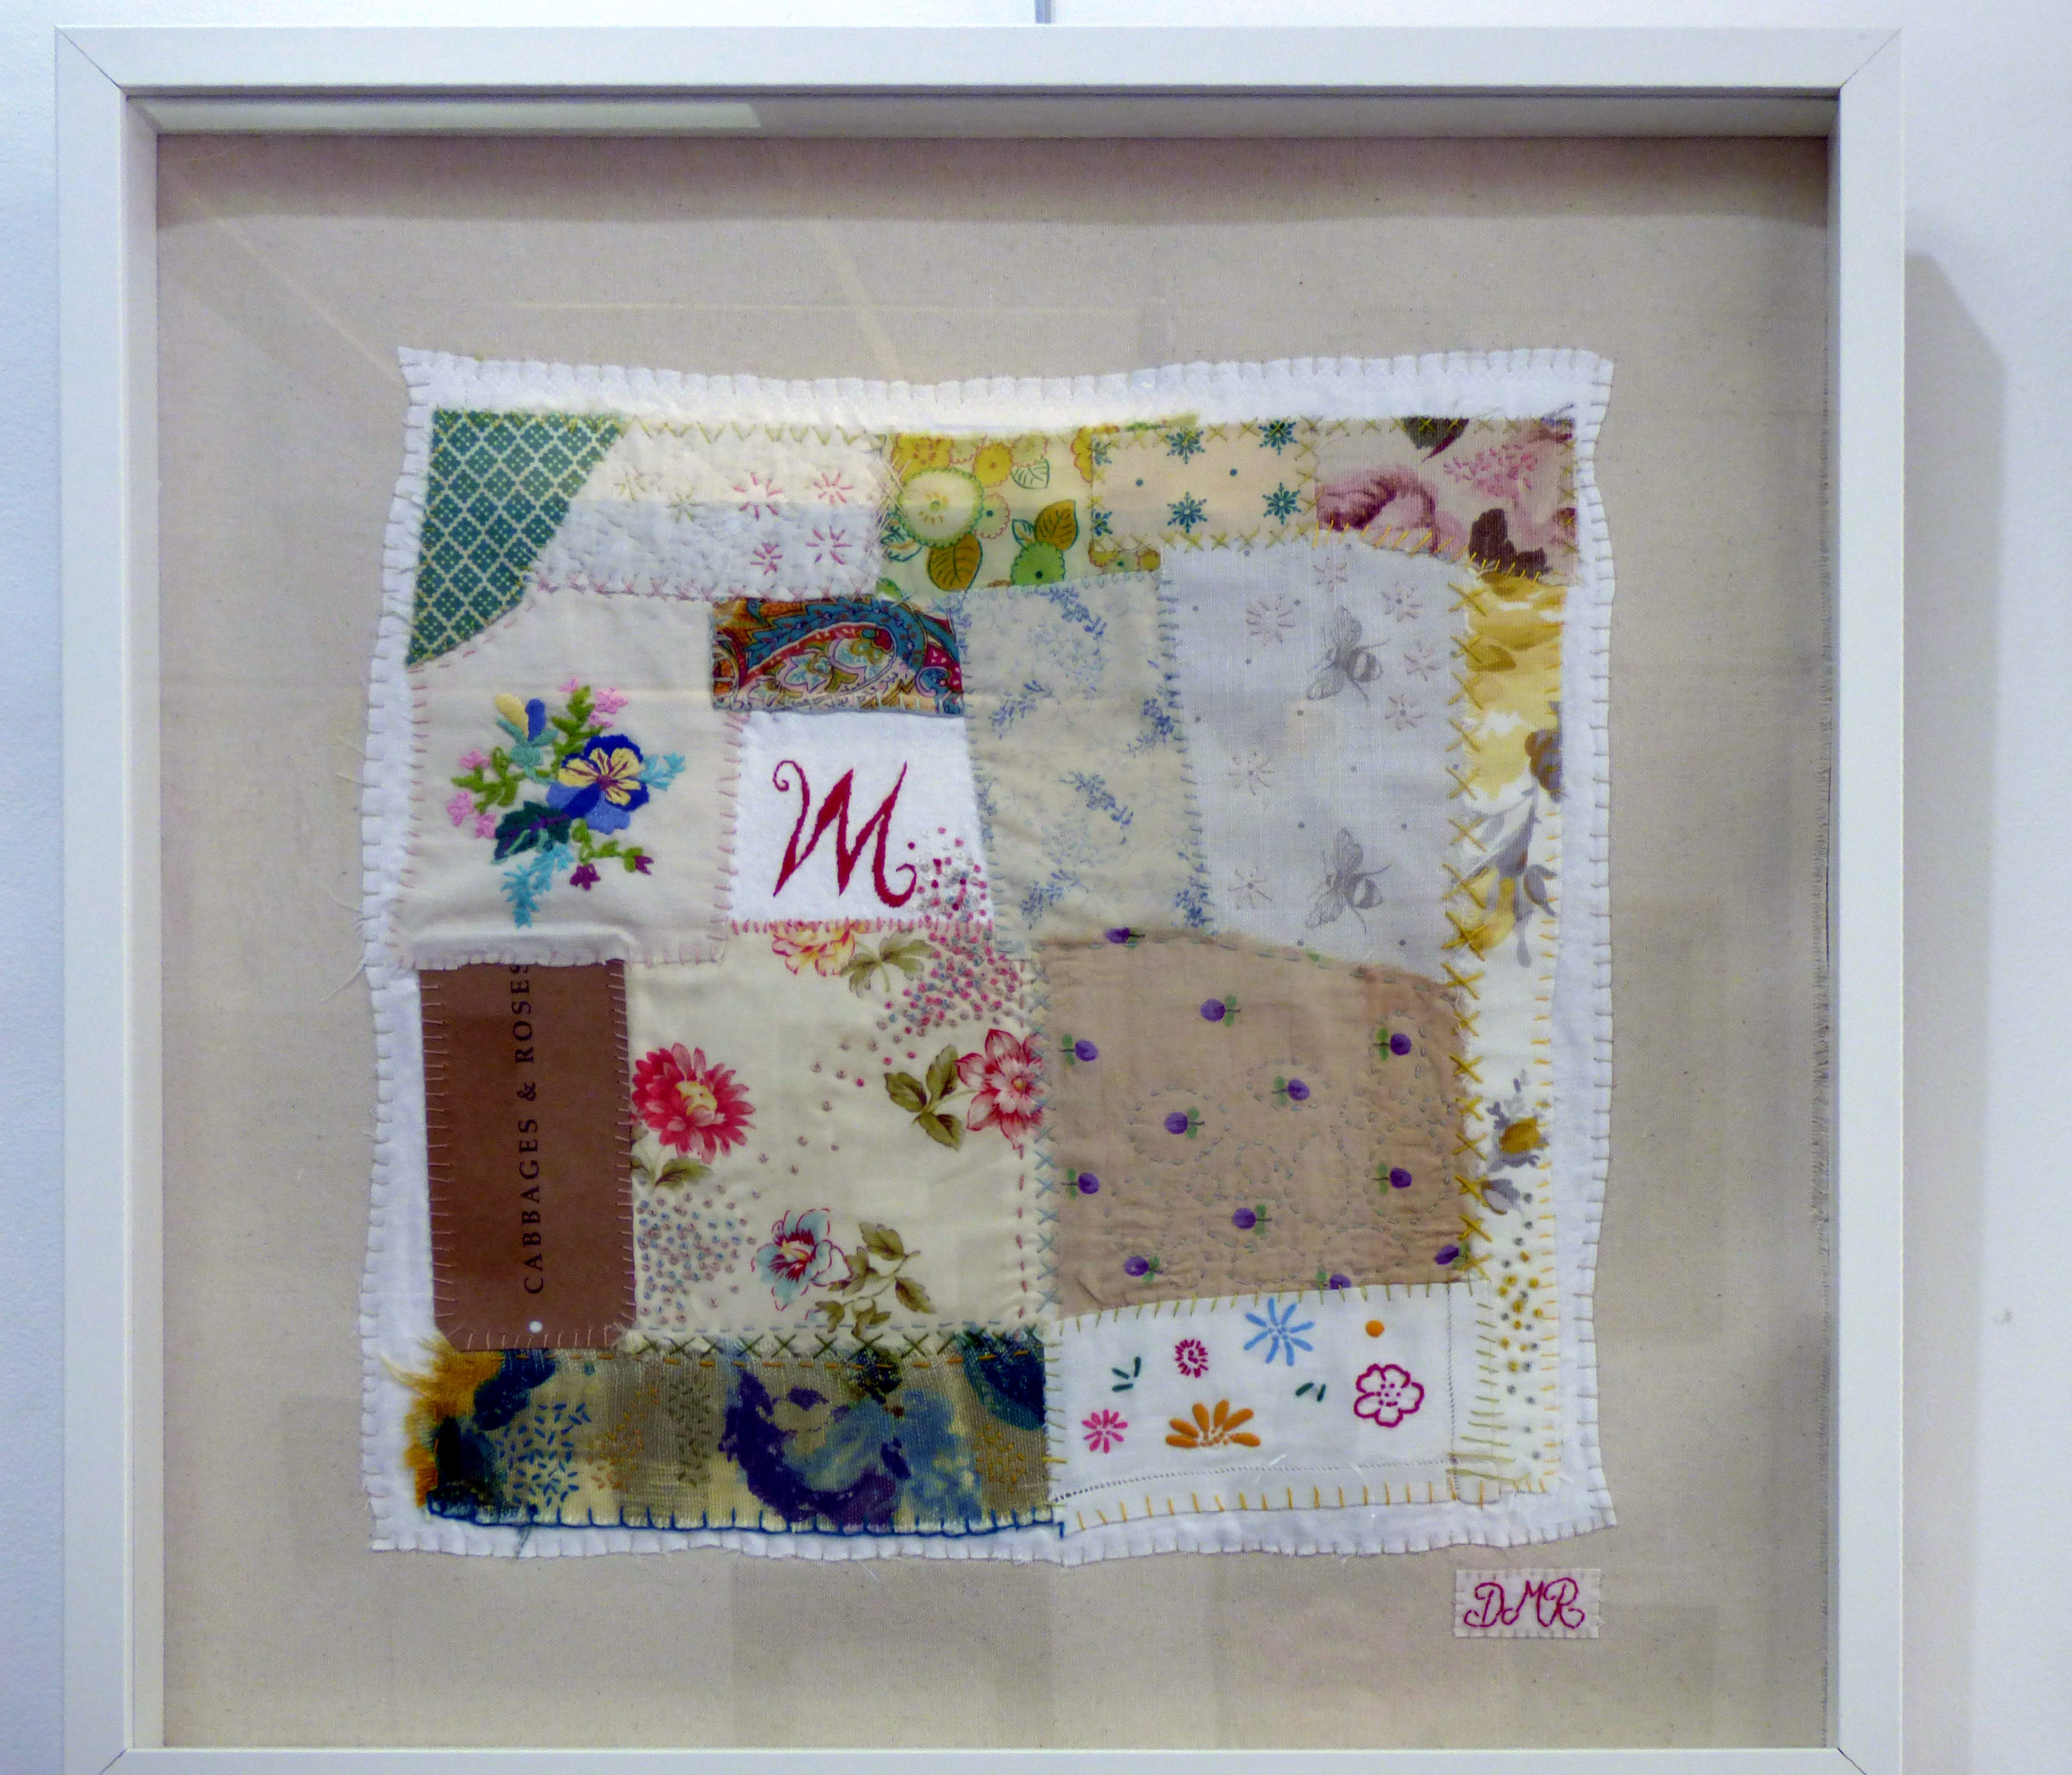 'M' FOR MOTHER by Deborah McLarnon-Riches, Parbold EG